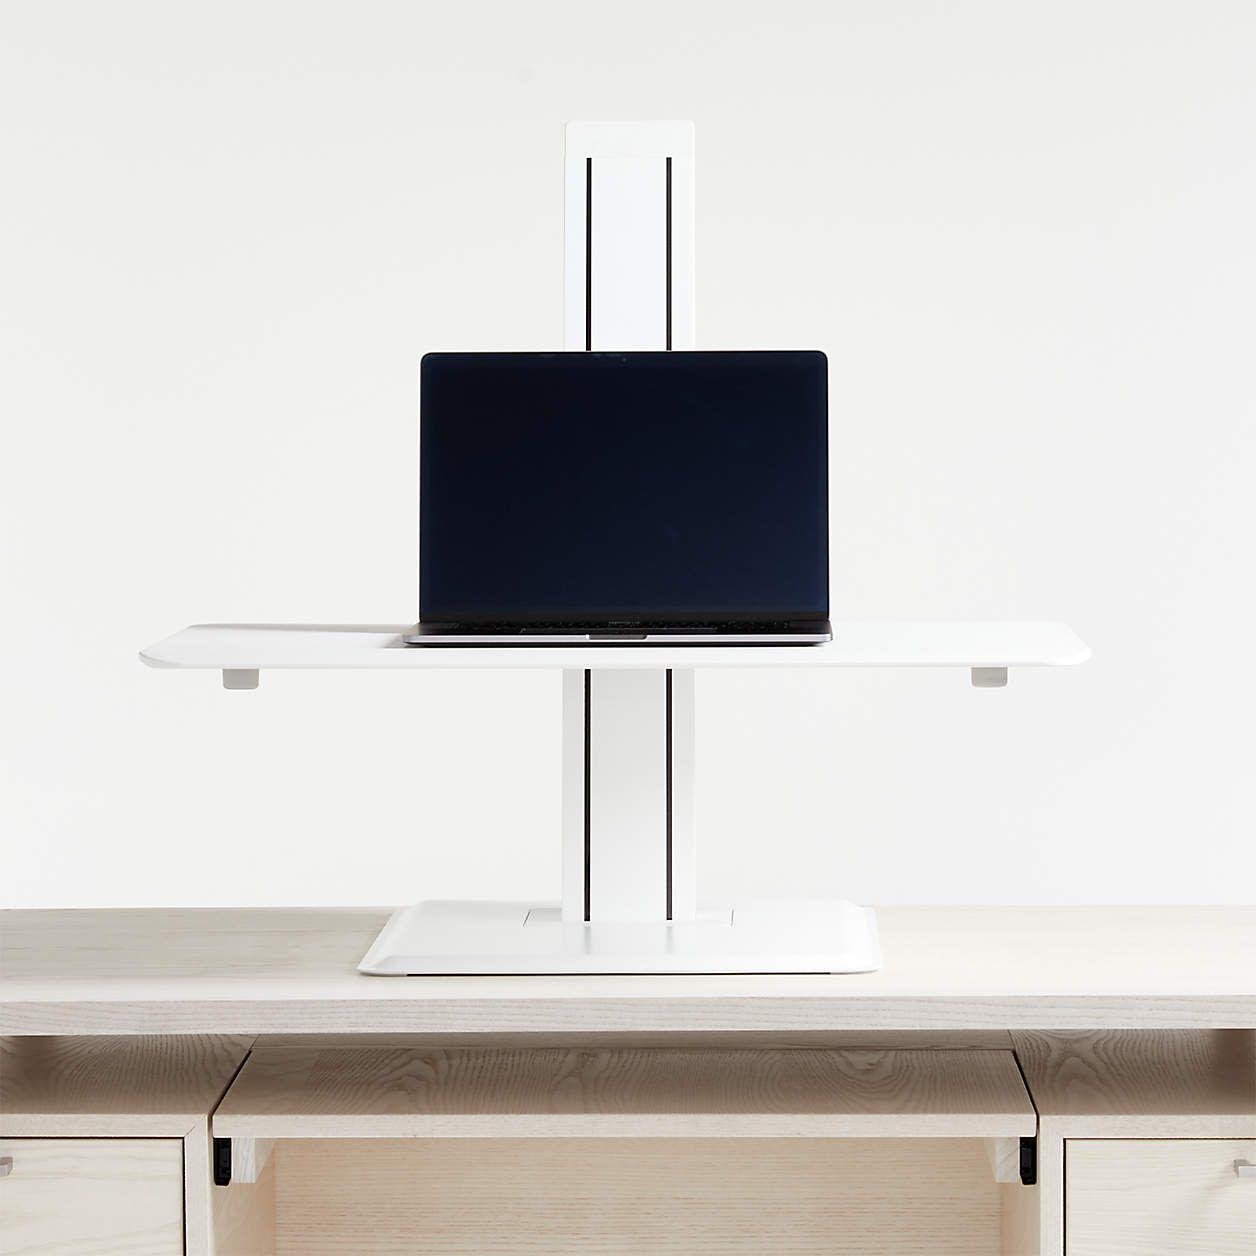 Crate & Barrel Humanscale Laptop Converter